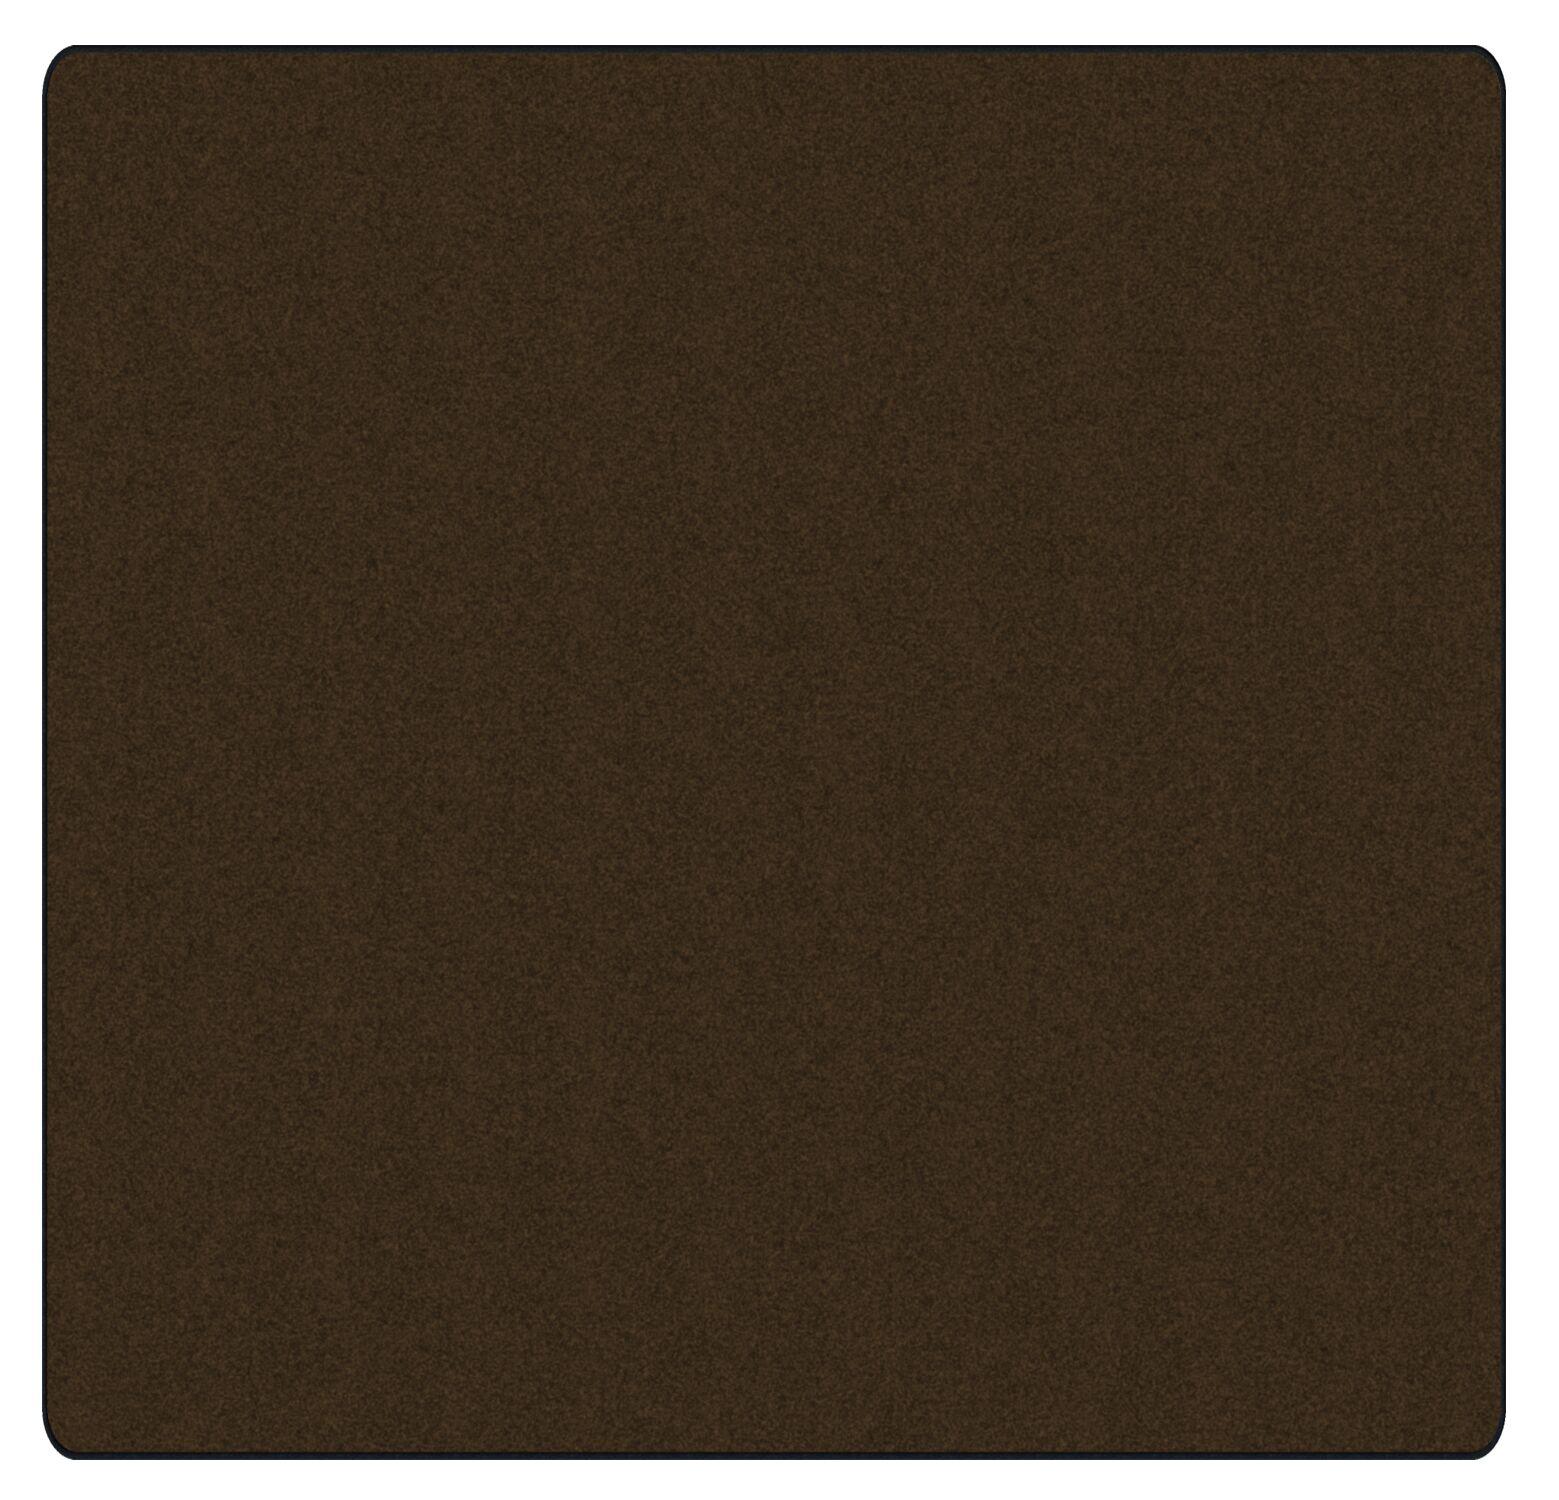 Americolors Chocolate Area Rug Rug Size: Square 6'